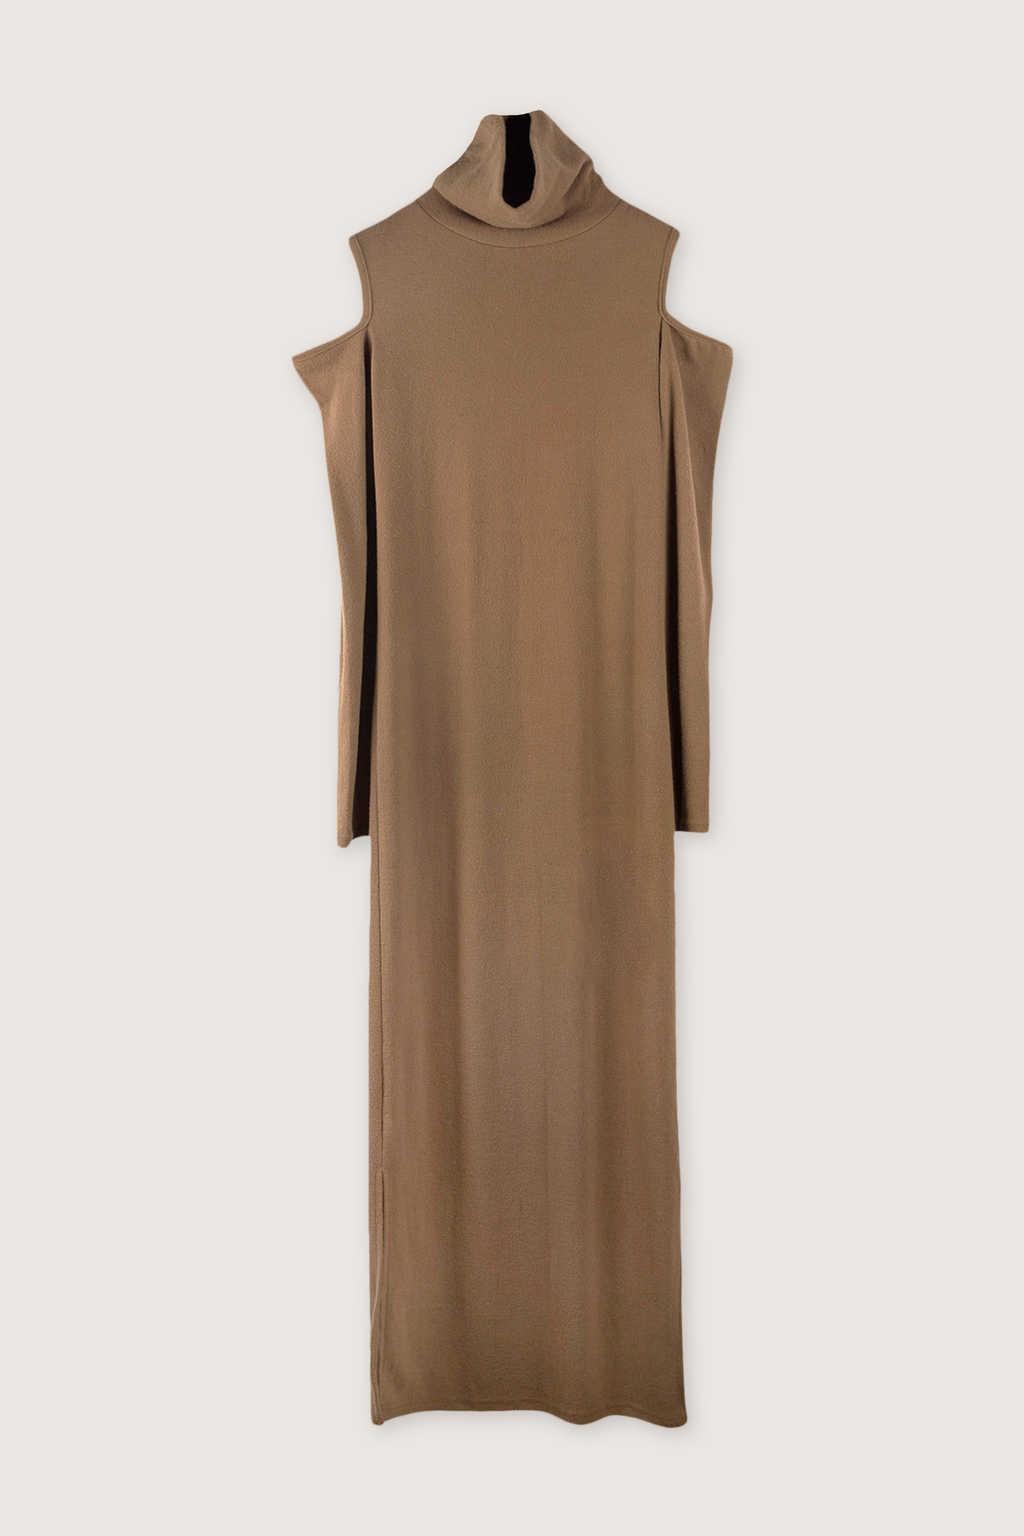 Dress H339 Beige 5